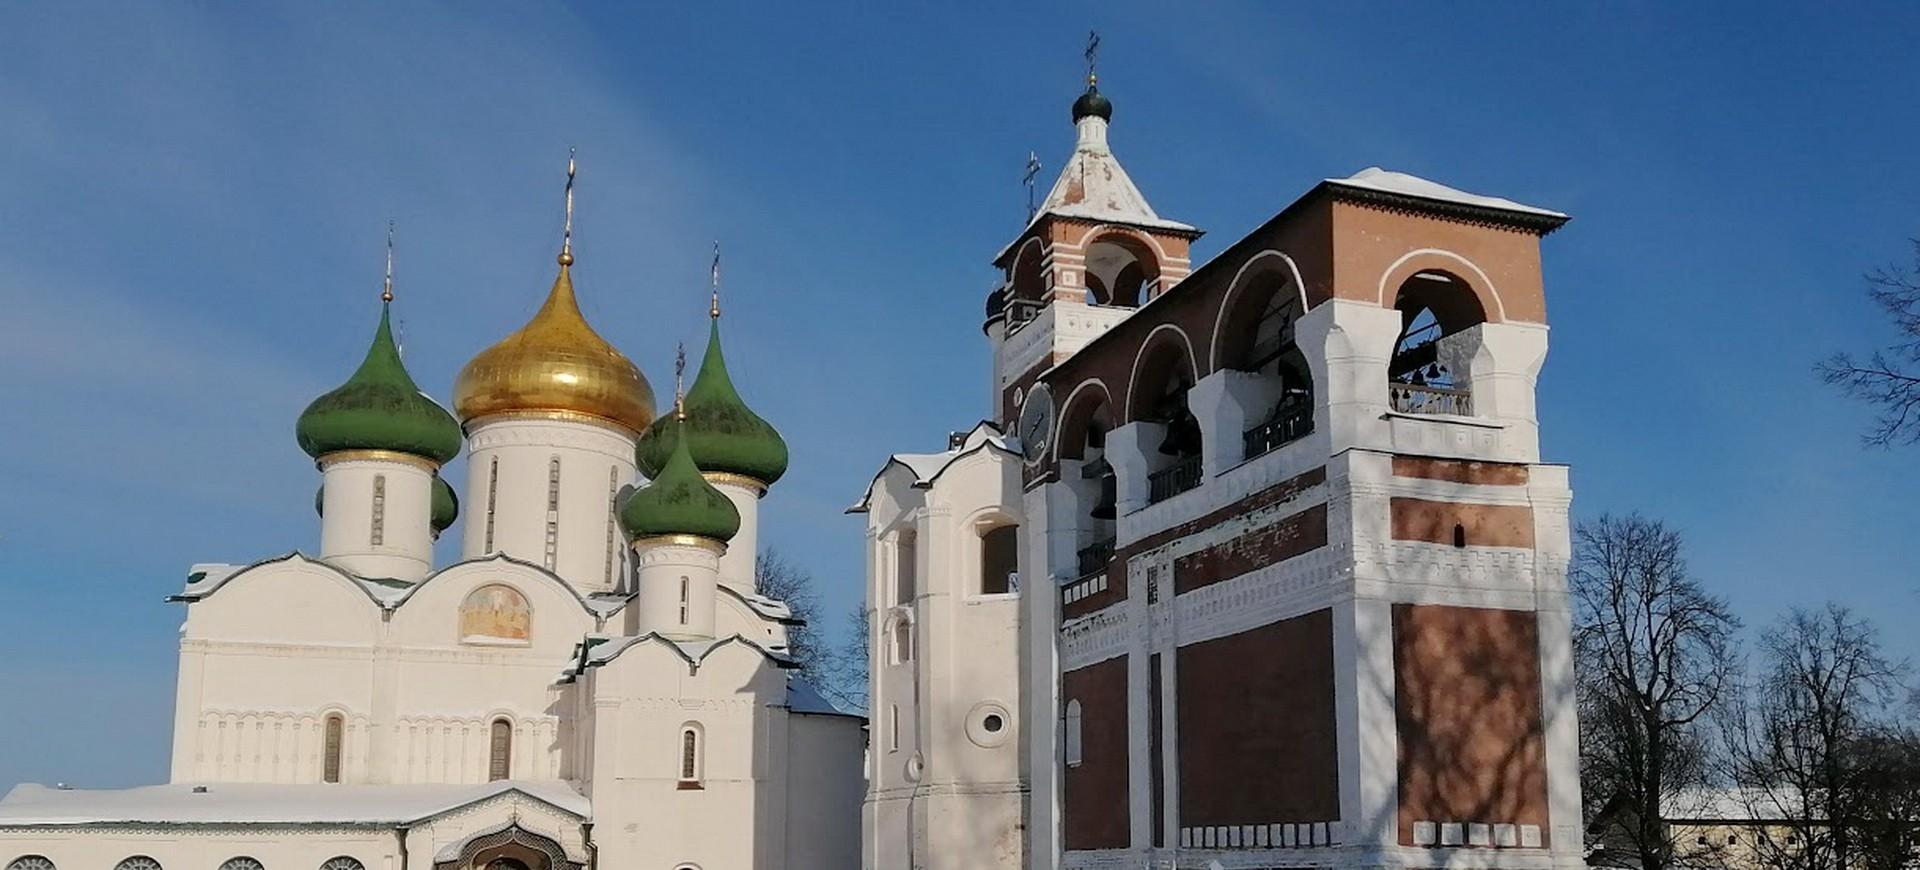 Russie Souzdal